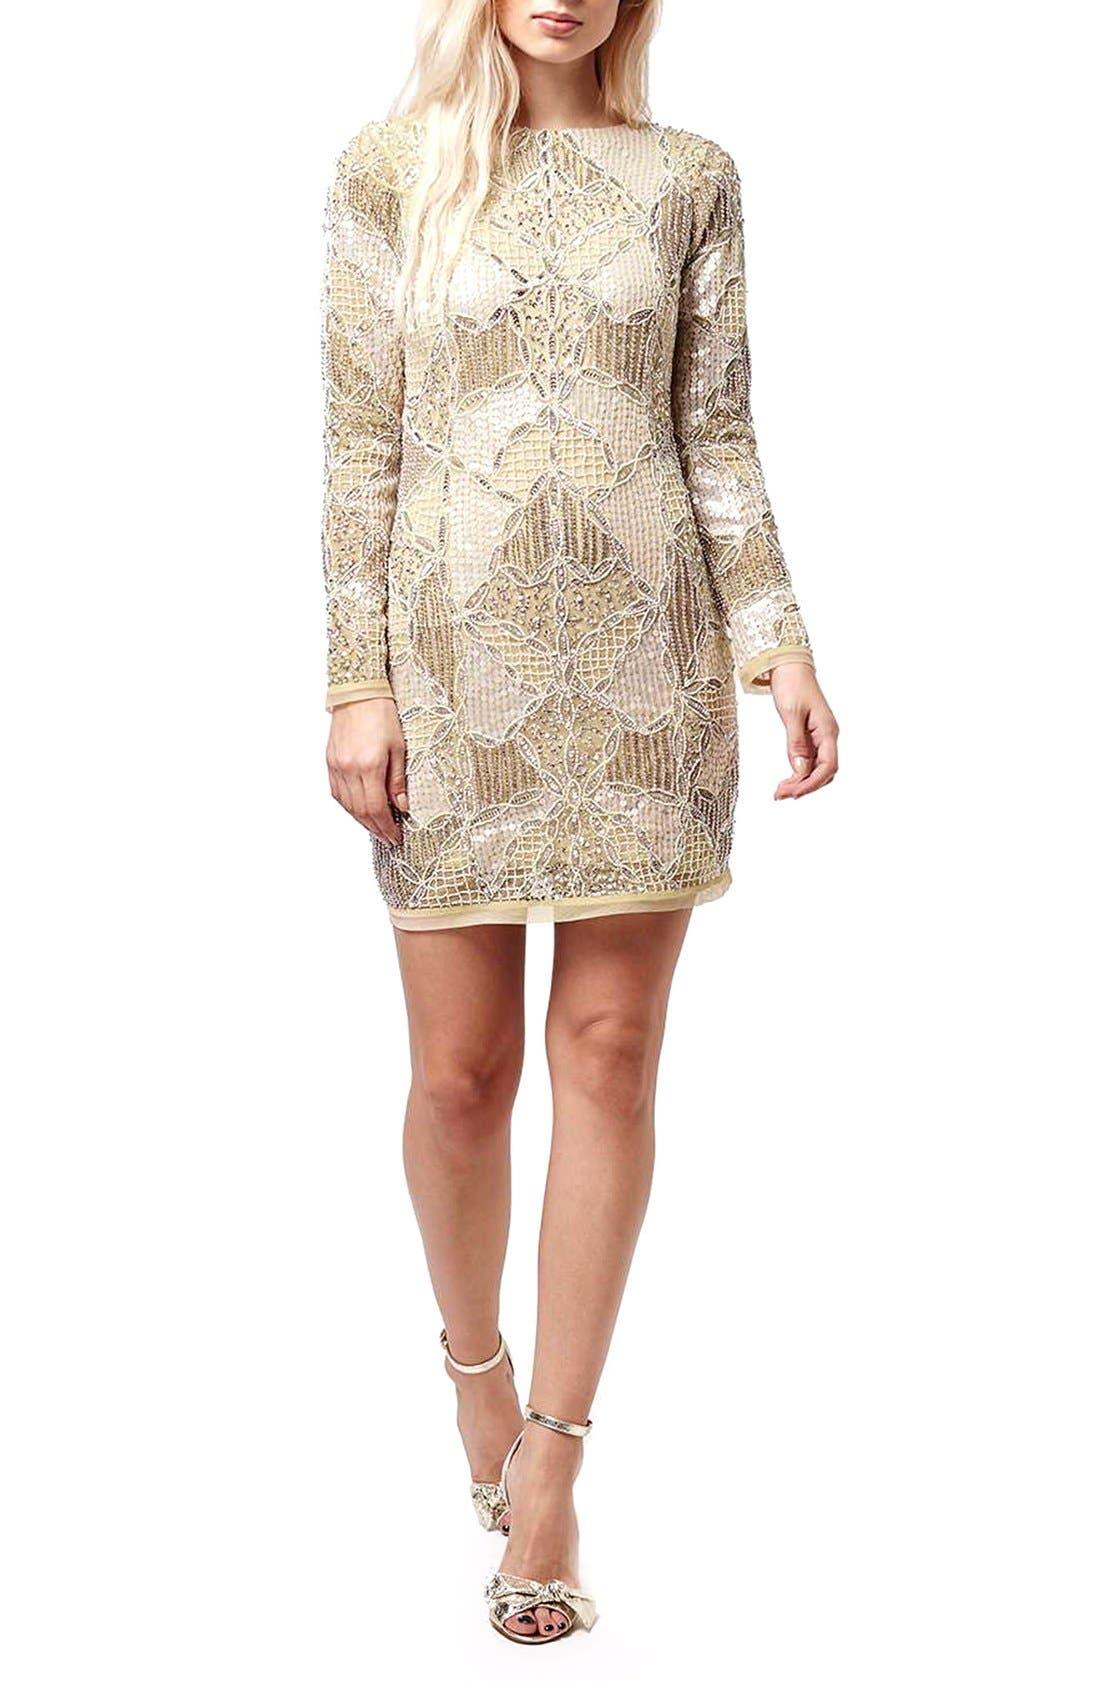 Main Image - Topshop 'Gigi' Embellished Body-Con Dress (Regular & Petite)